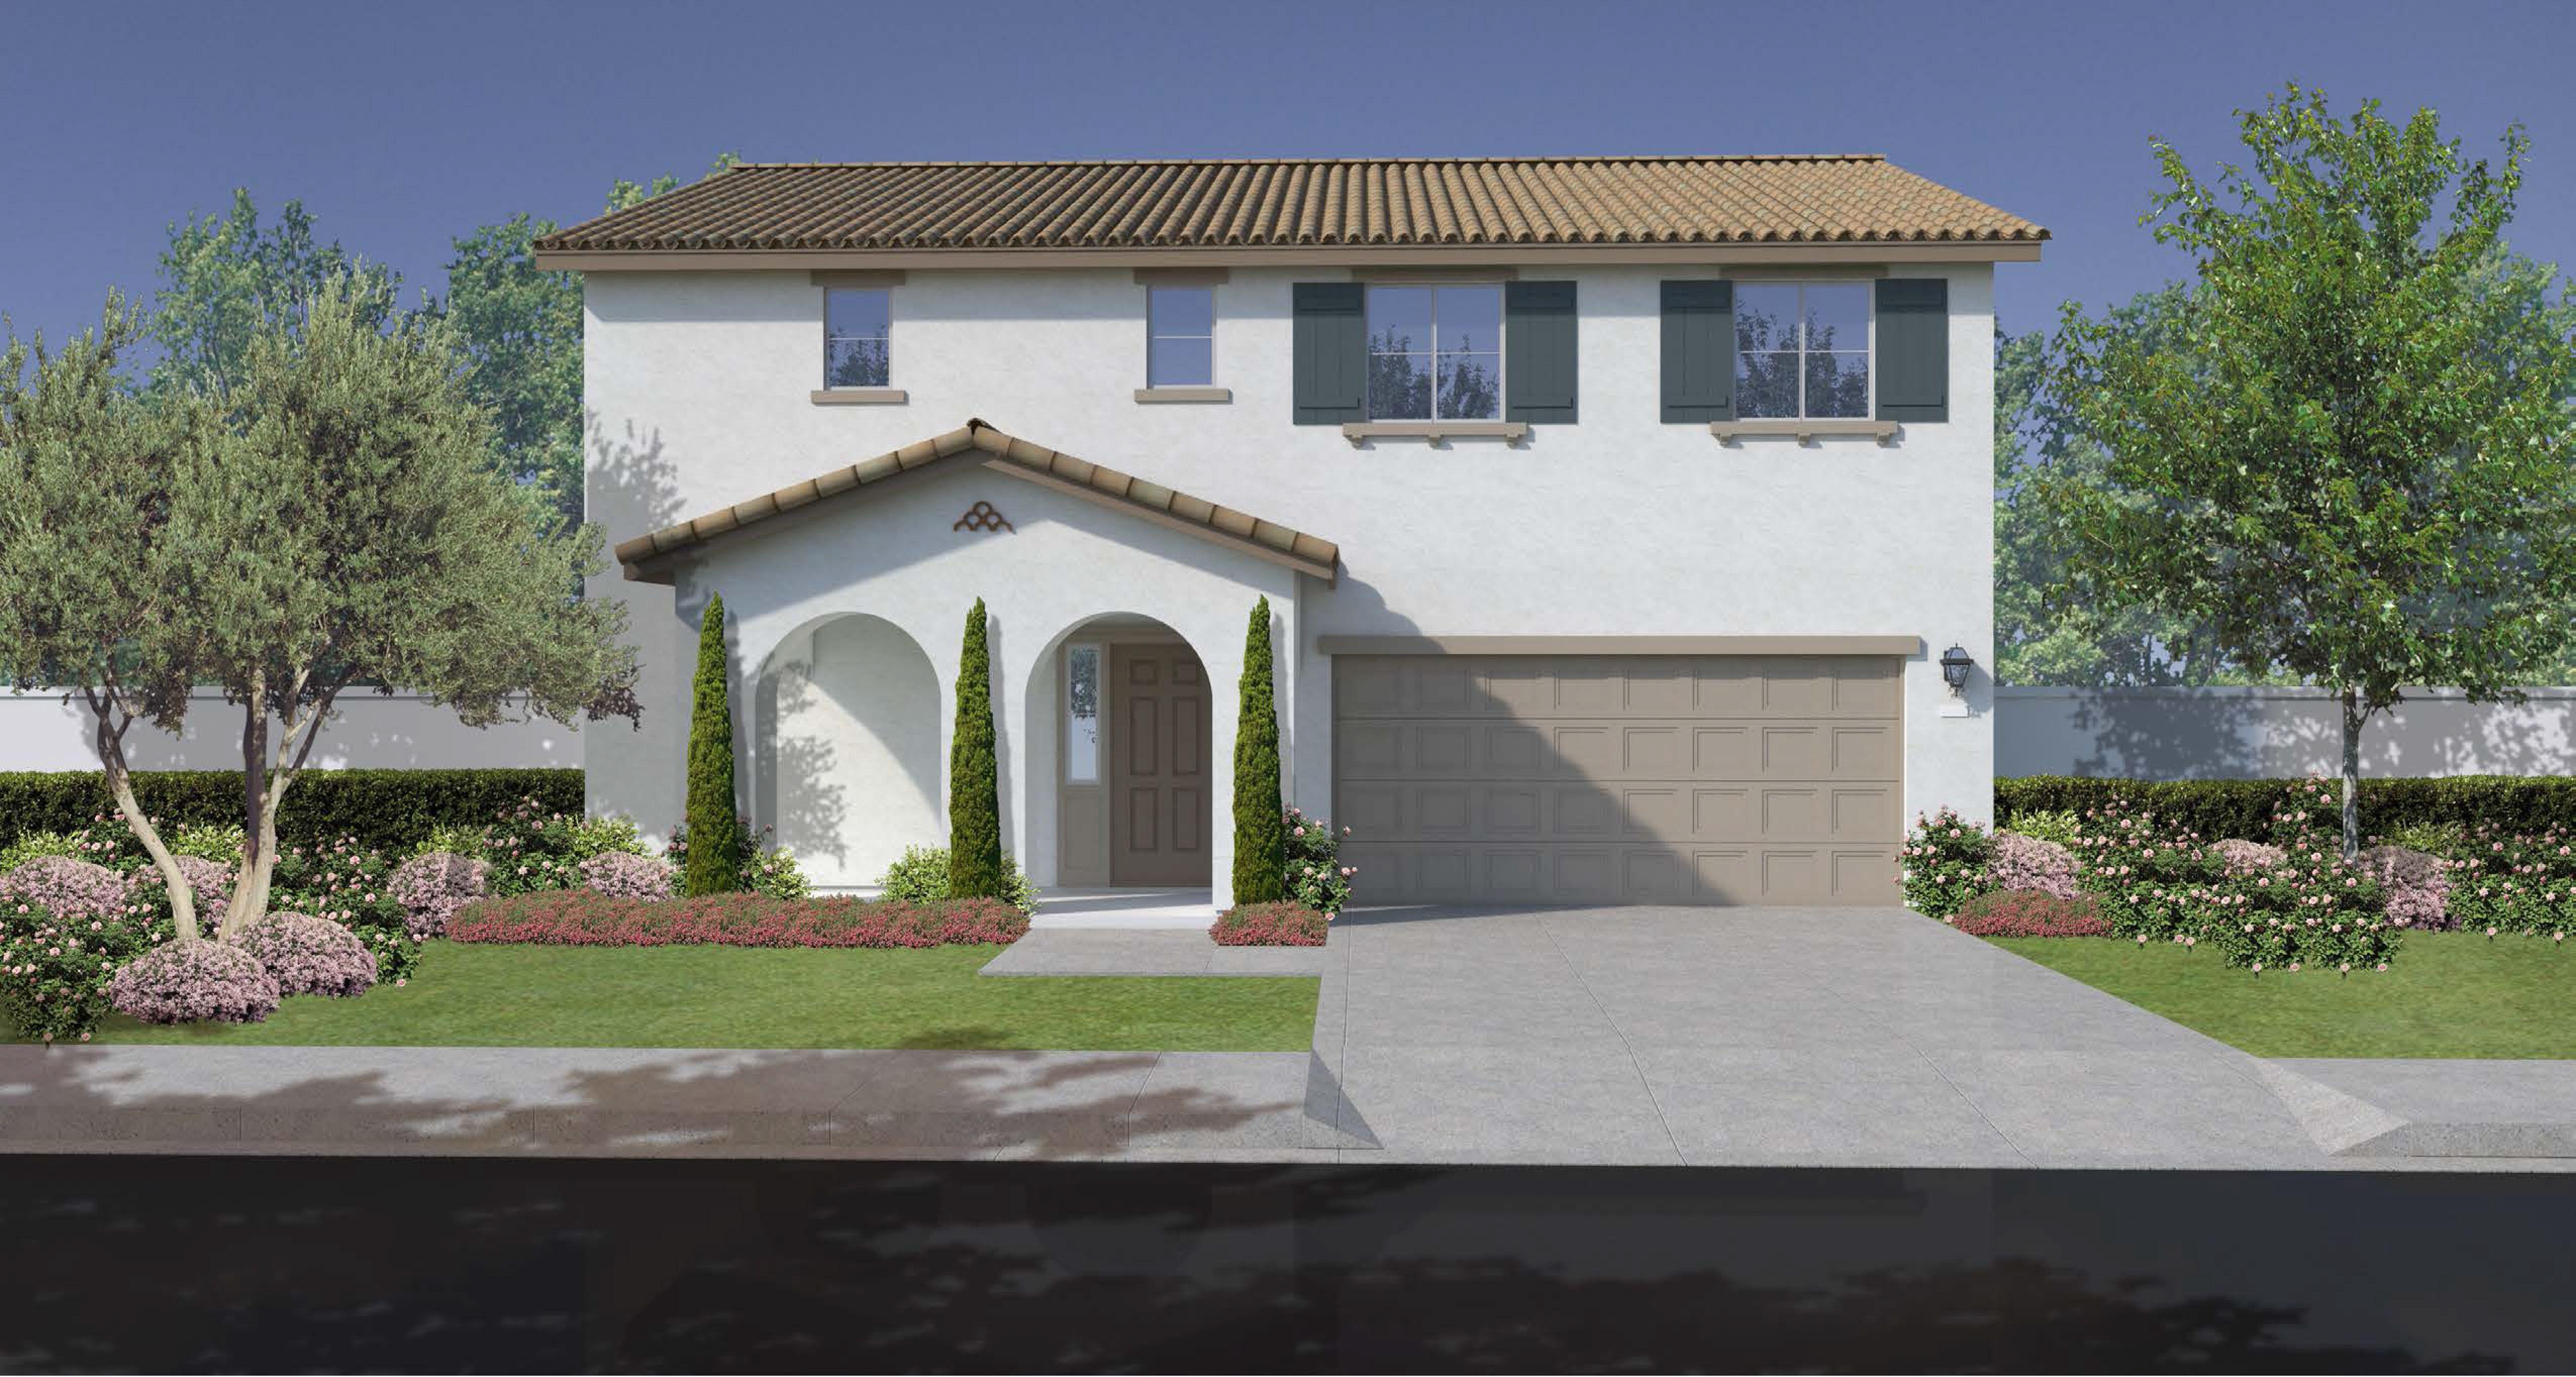 New Homes in San Bernardino CA New Homes